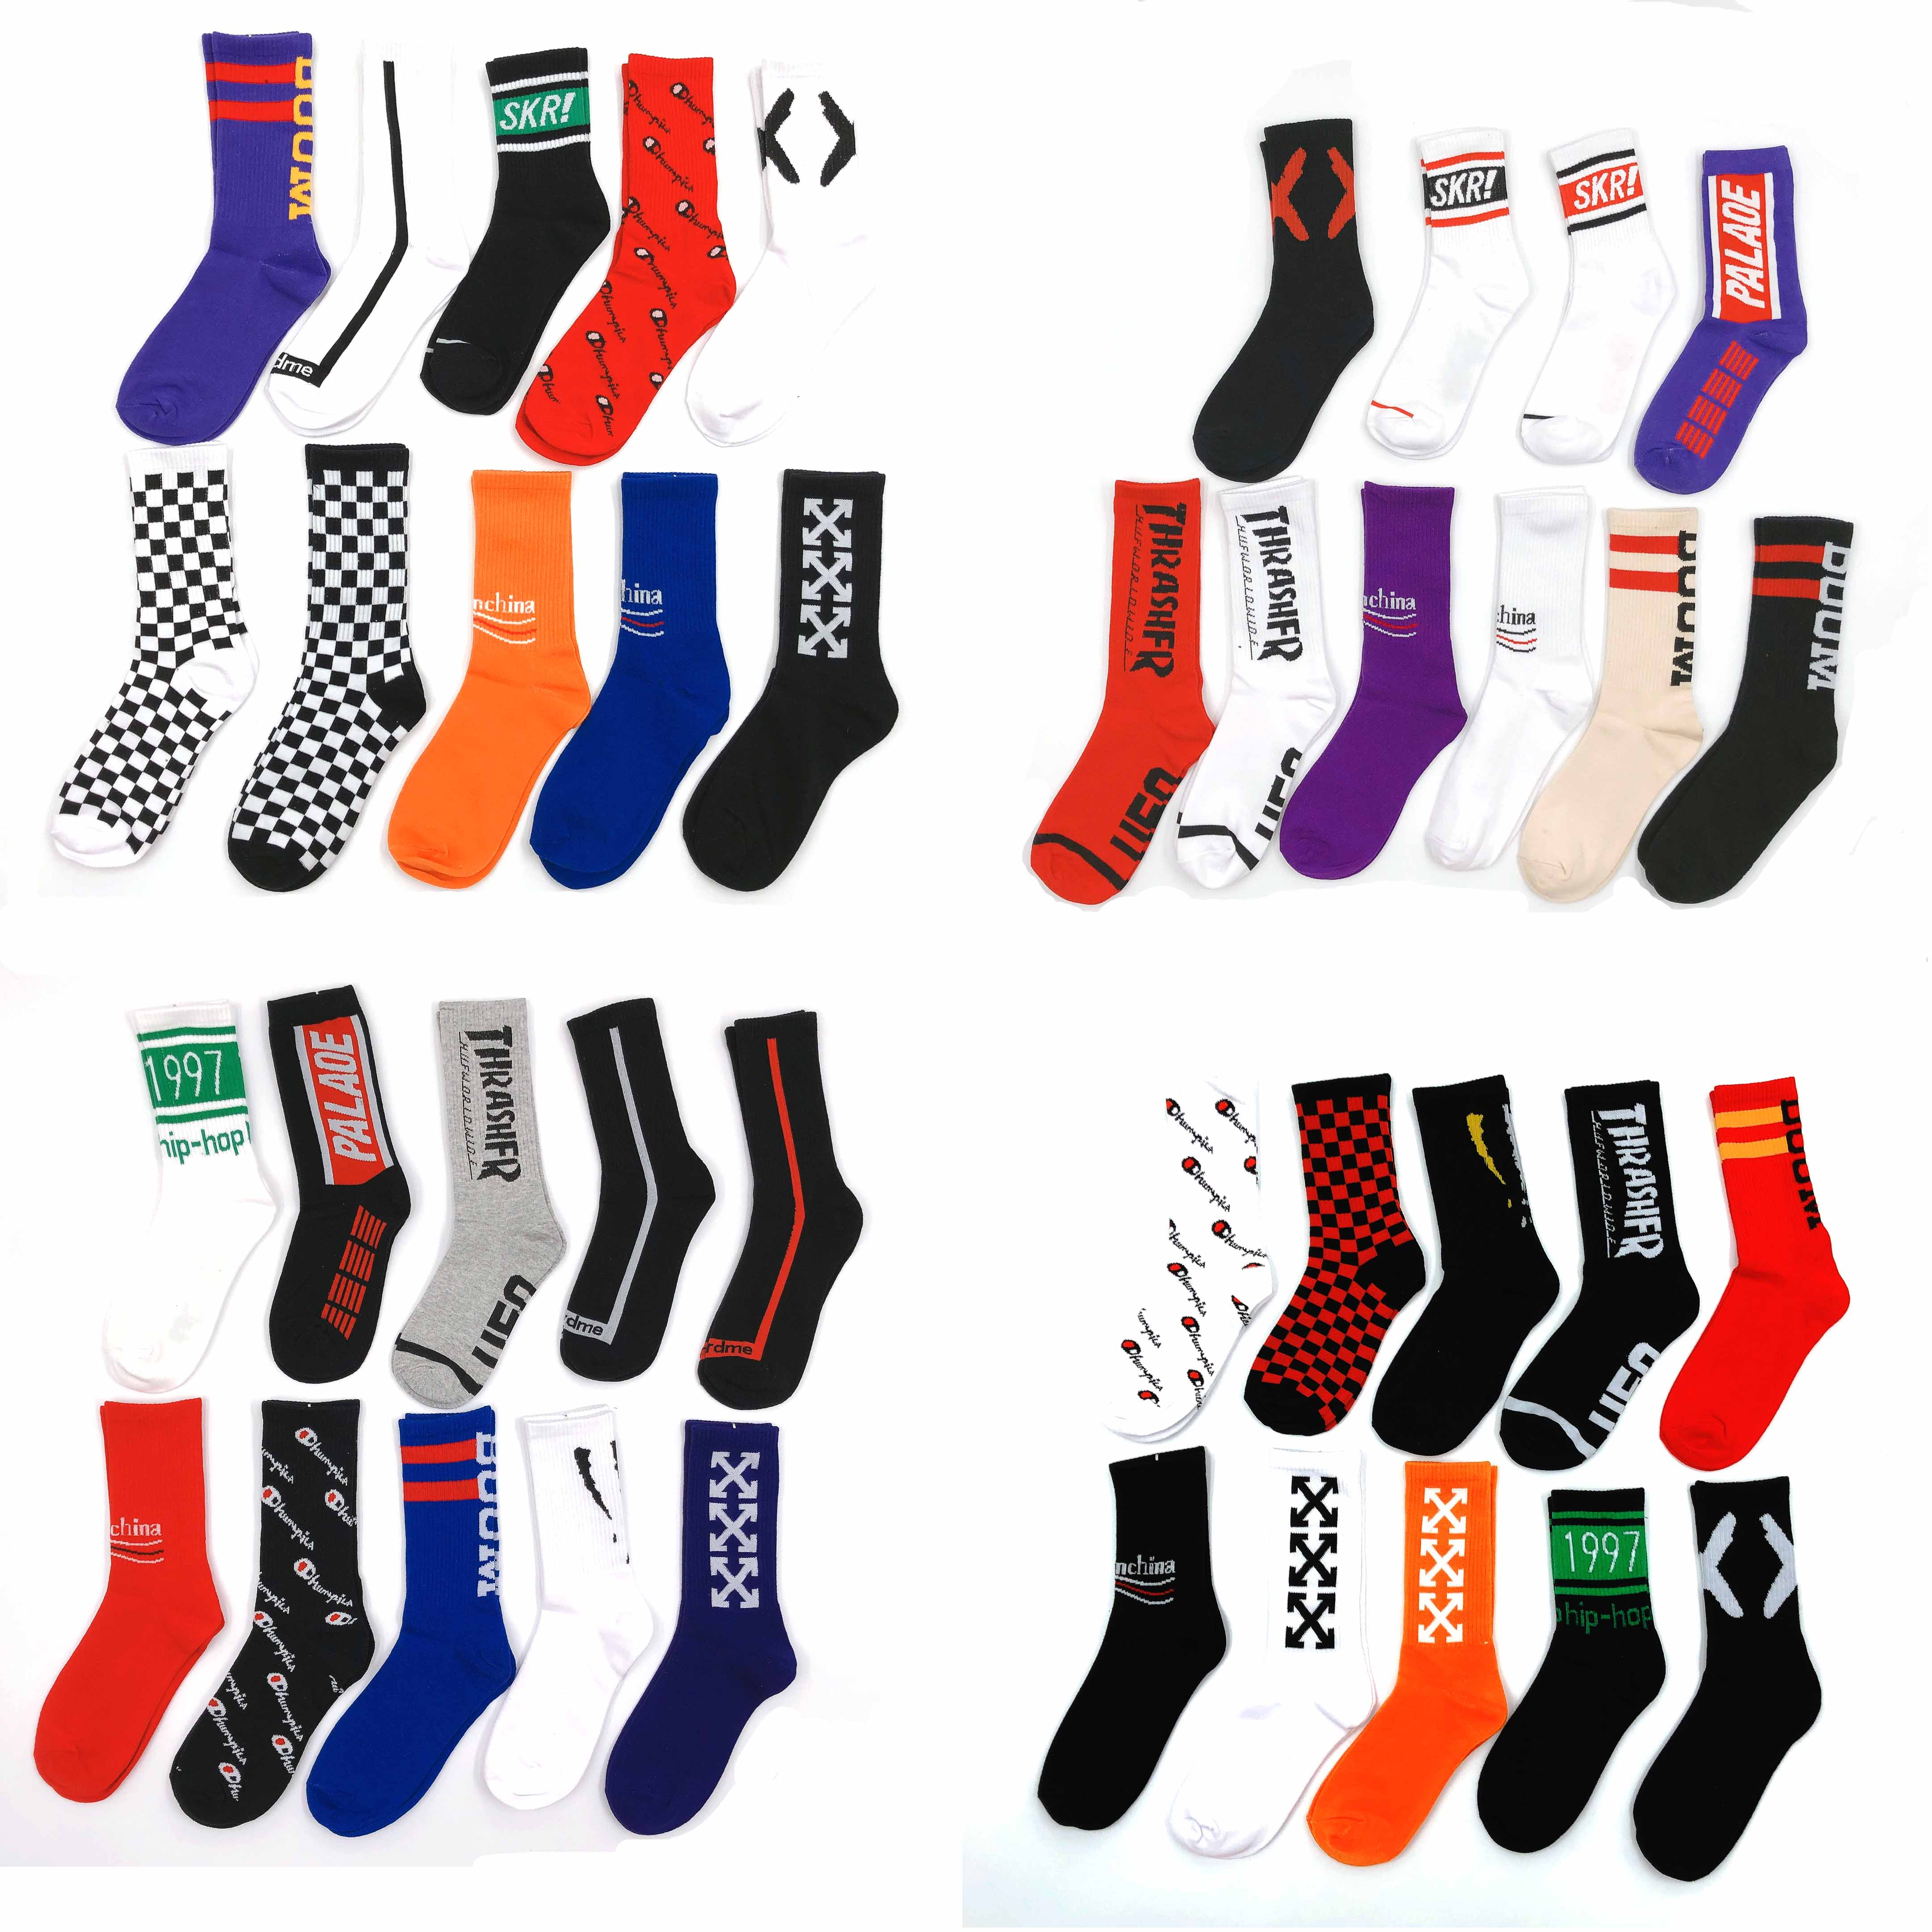 Women Men Socks Fashion Brand Street Pattern Sports Art Dance Hip-hop European American Style Colorful Sports Cotton Socks